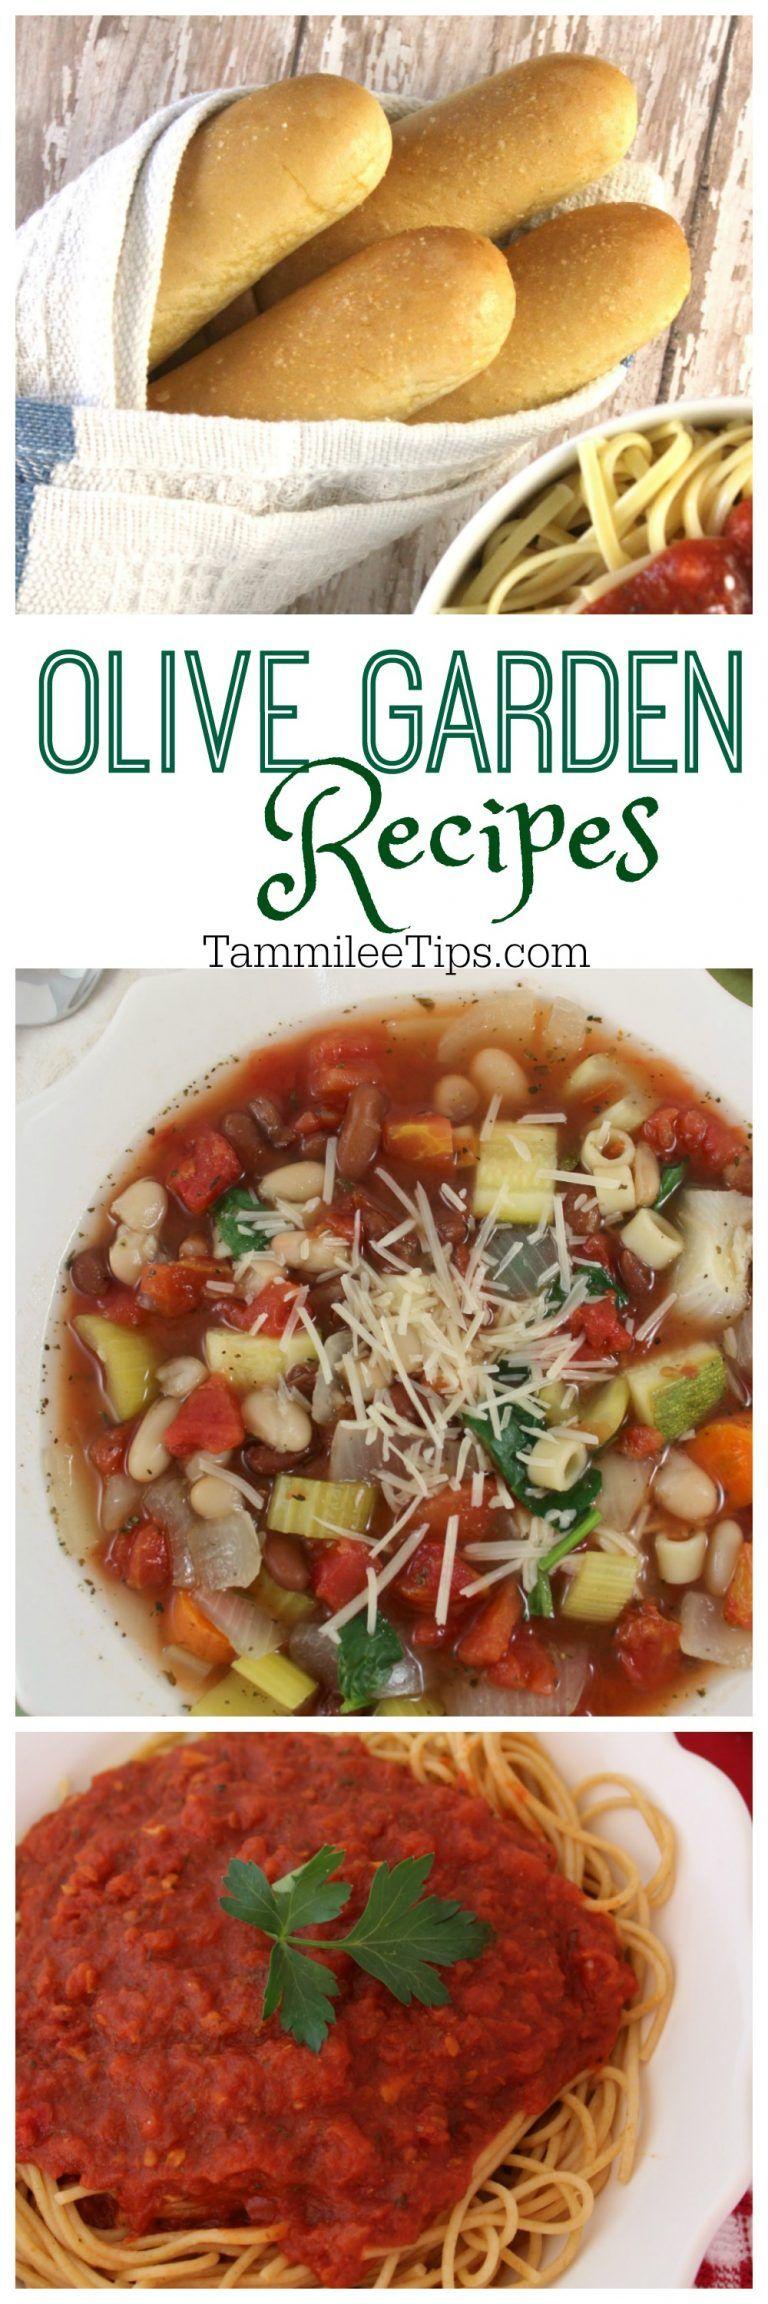 CopyCat Olive Garden Soup, Breadsticks, Marinara Sauce and